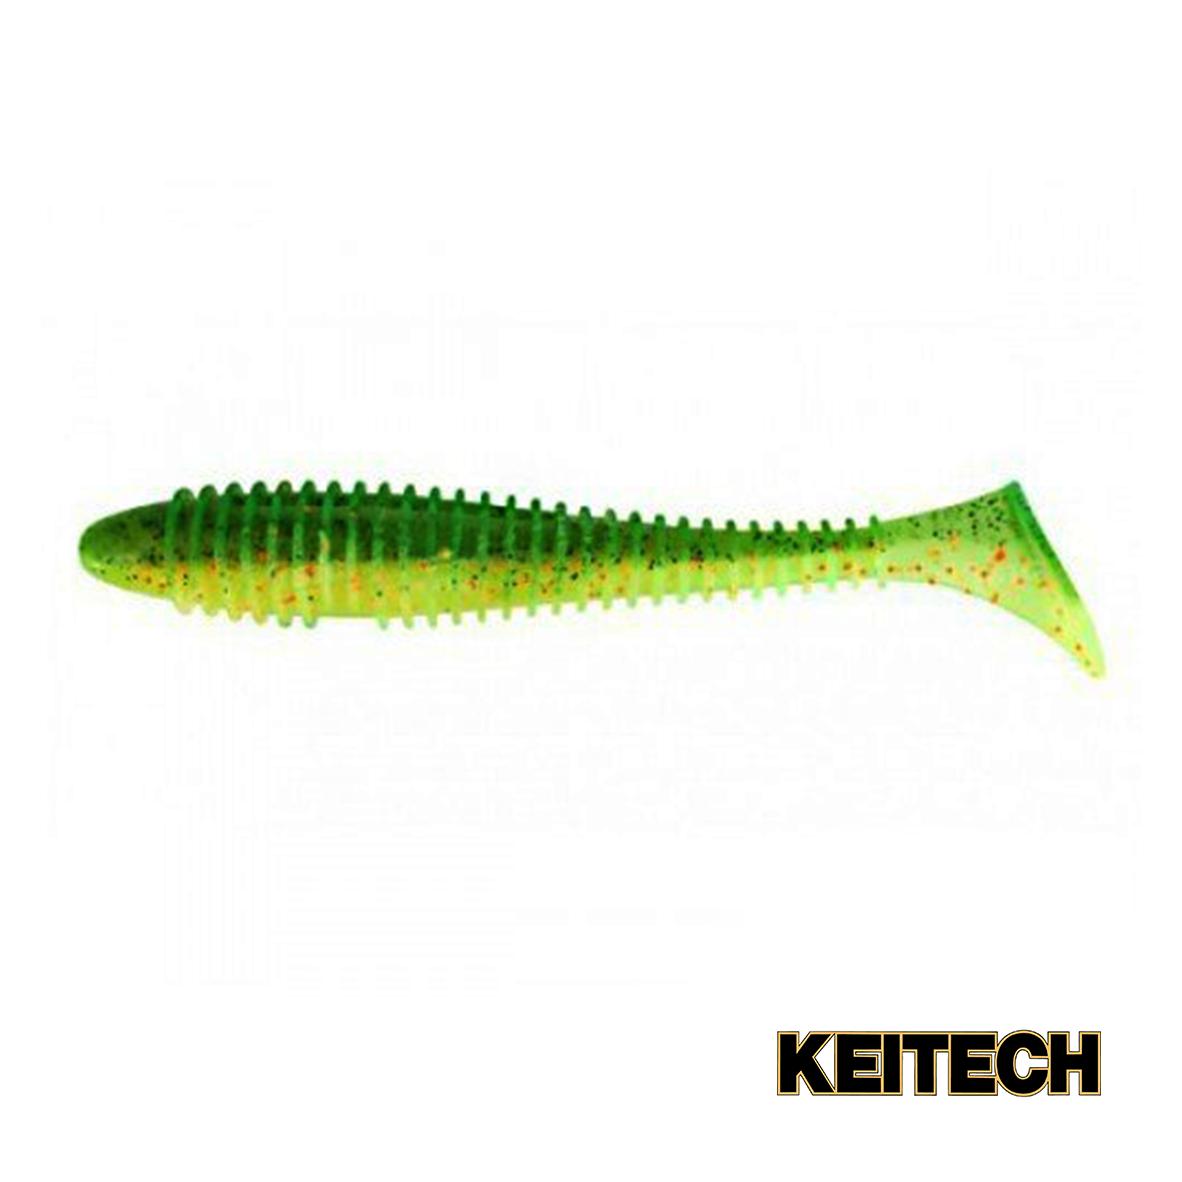 "Силикон Keitech Swing Impact FAT 4.8"" (5 шт/упак) ц:ea#05 hot fir"